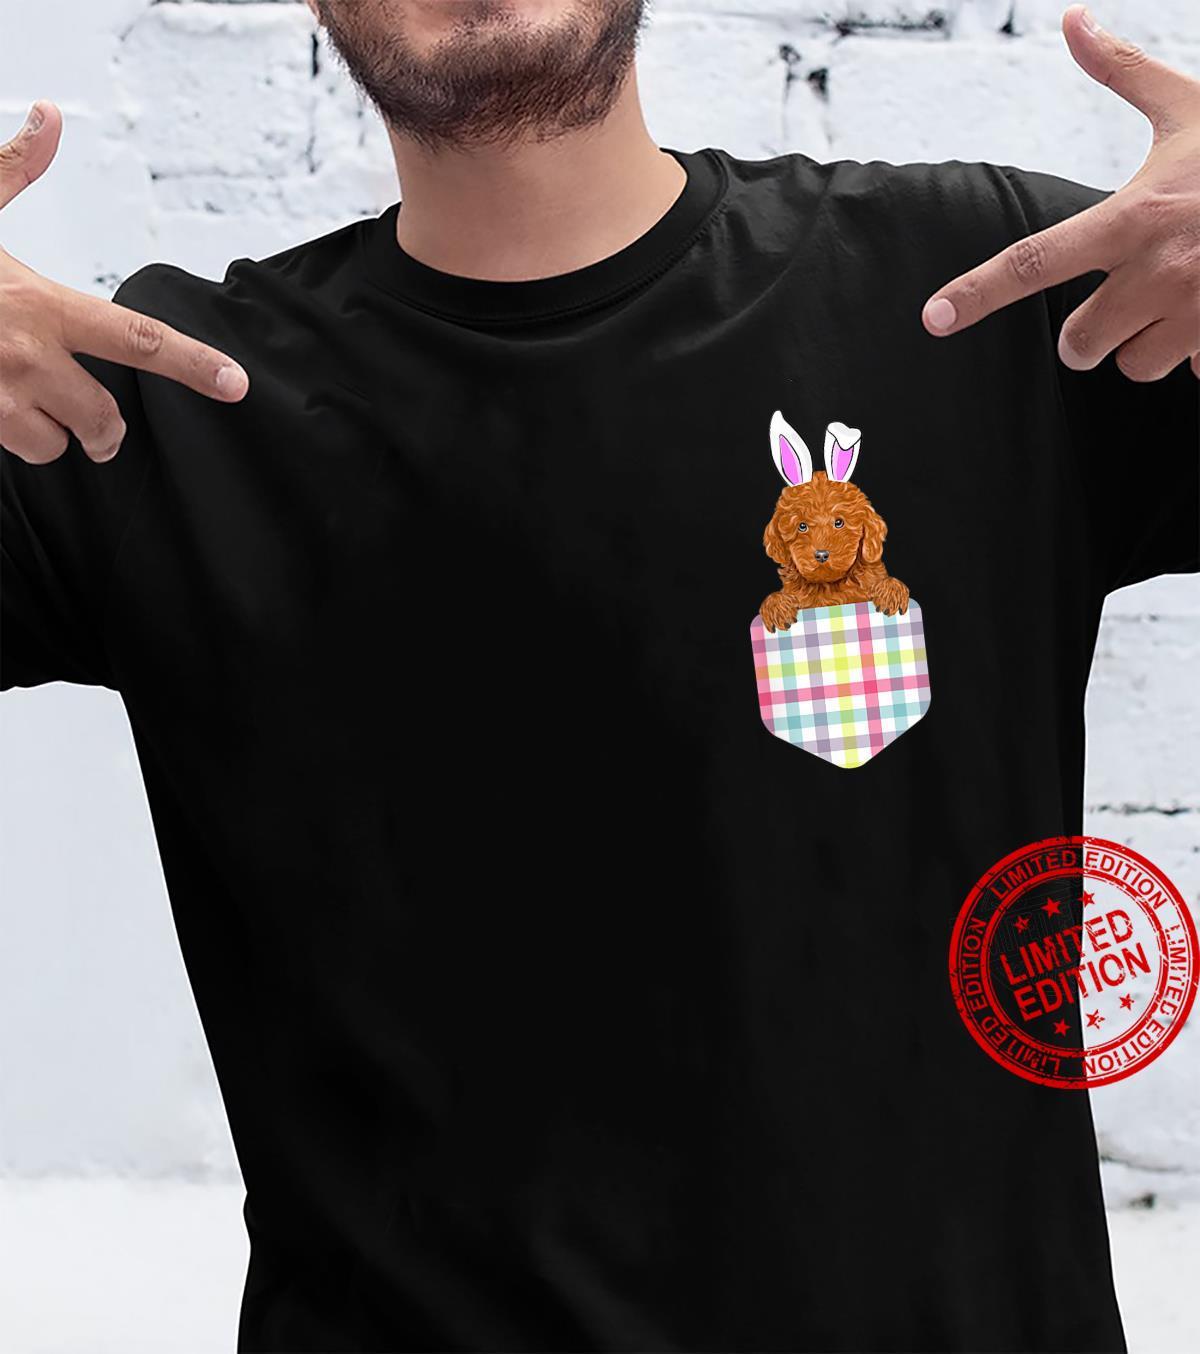 Easter Plaid Brown Poodle Bunny Dog In Pocket Shirt